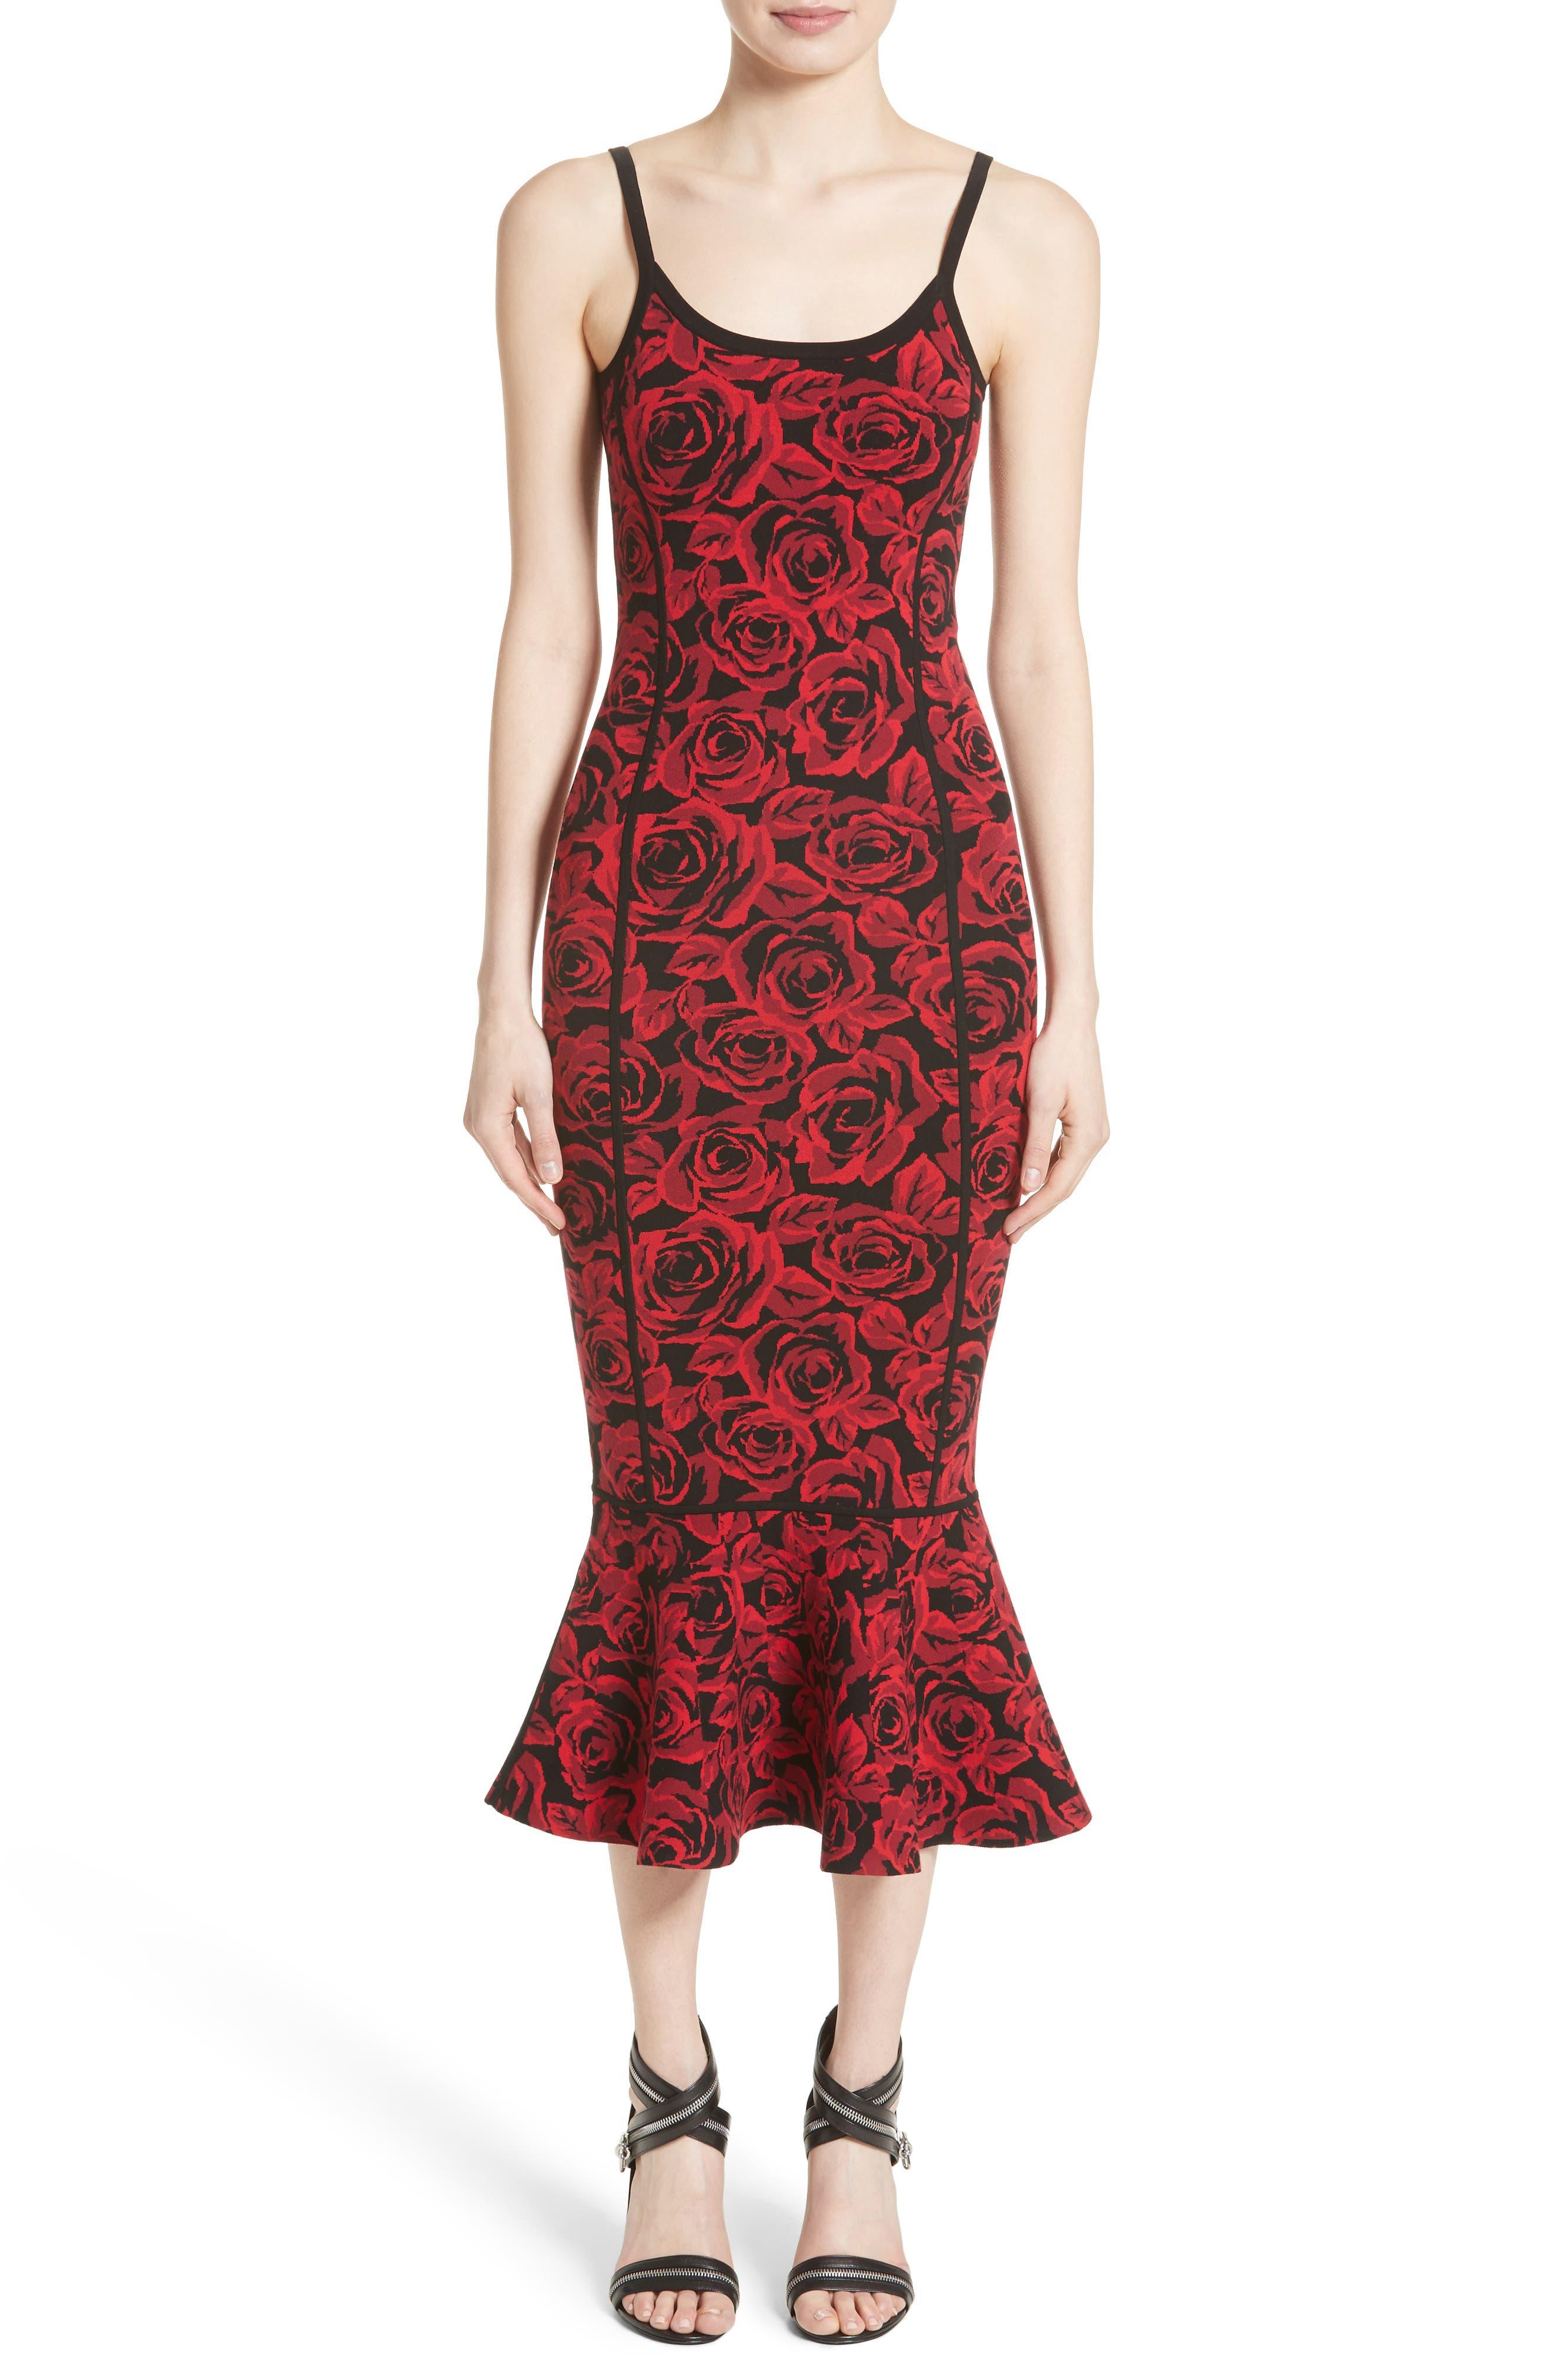 Main Image - Michael Kors Stretch Rose Jacquard Tank Dress